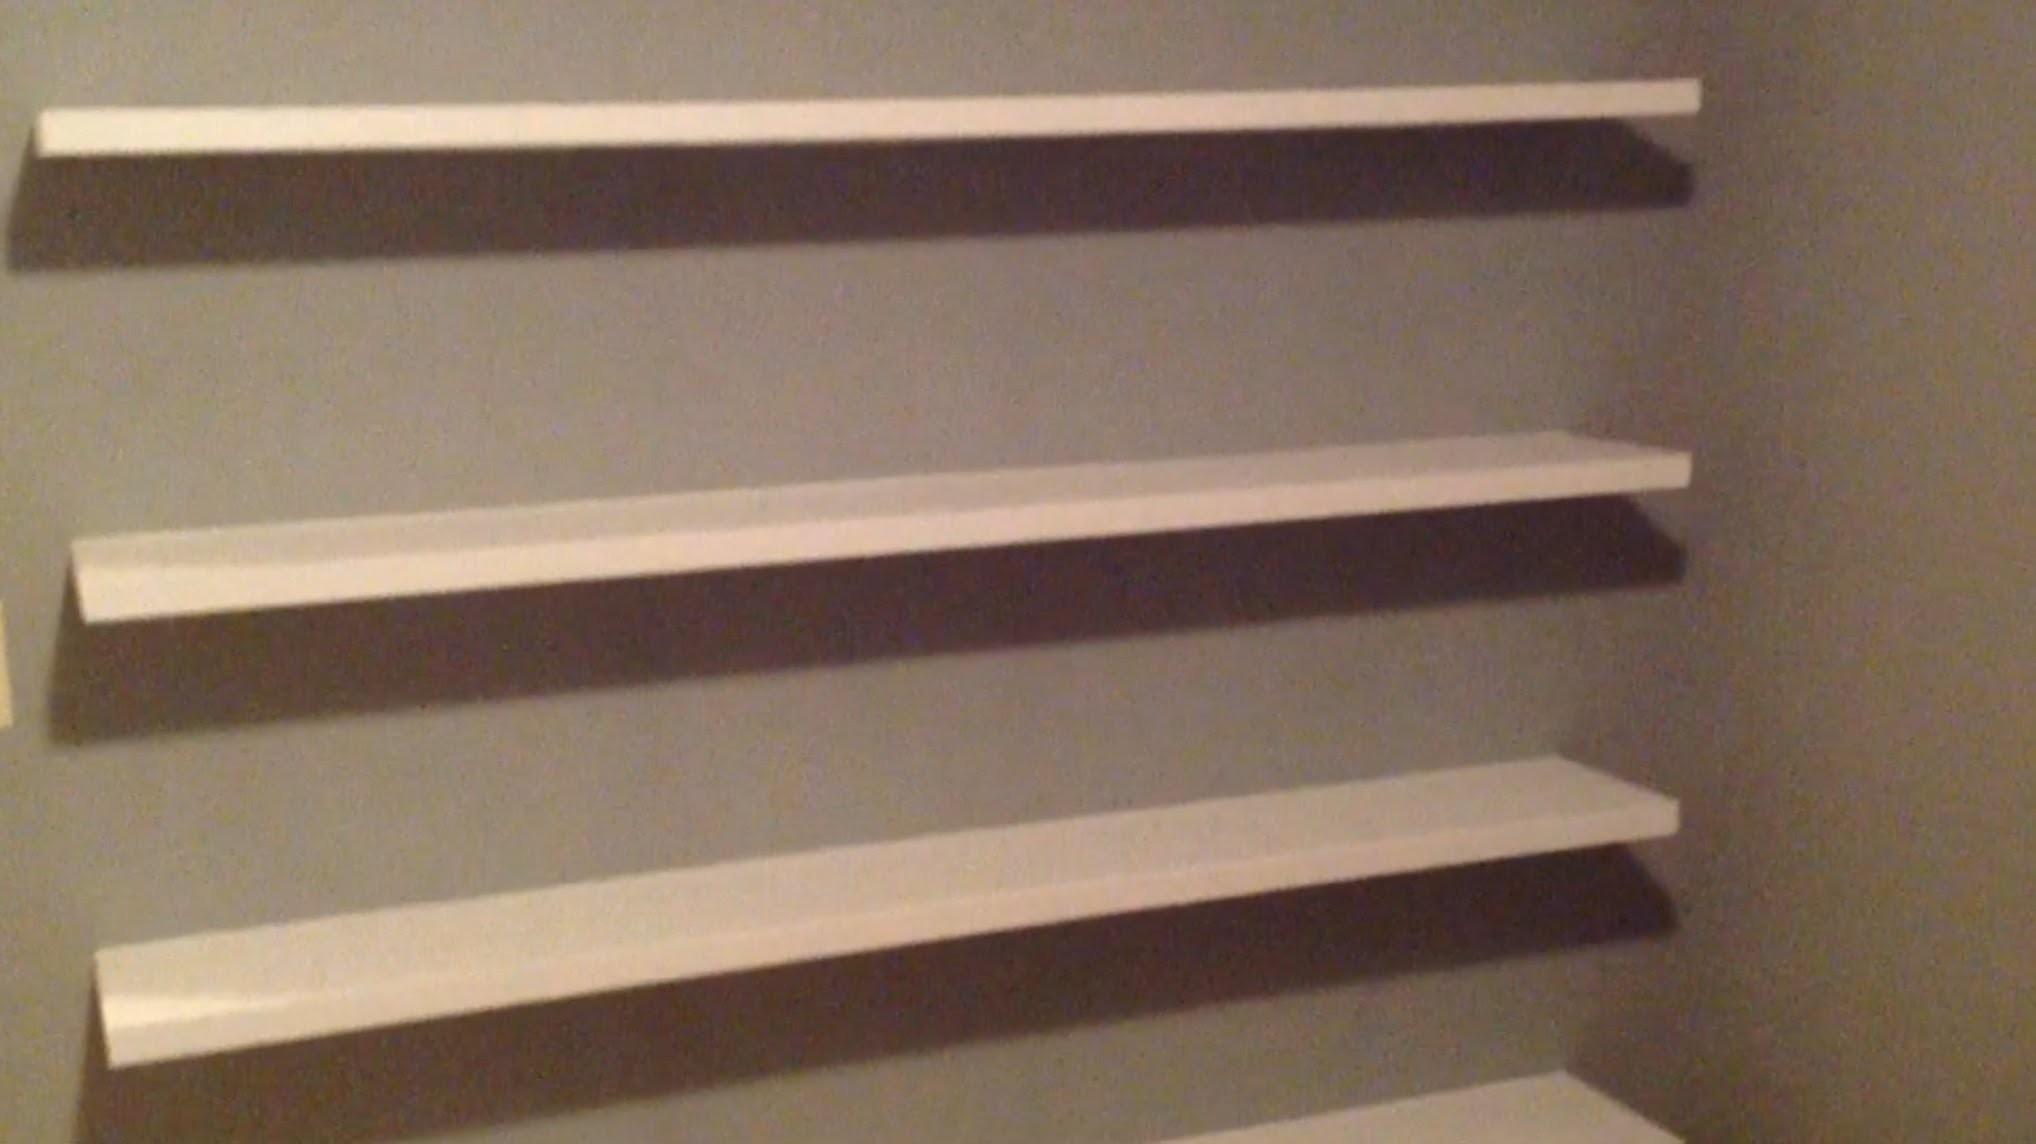 pdf make floating wall shelf plans the inductive prevnav nextnav countertop brackets black crown molding ikea metal expedit white radiator struts plastic modular shelving